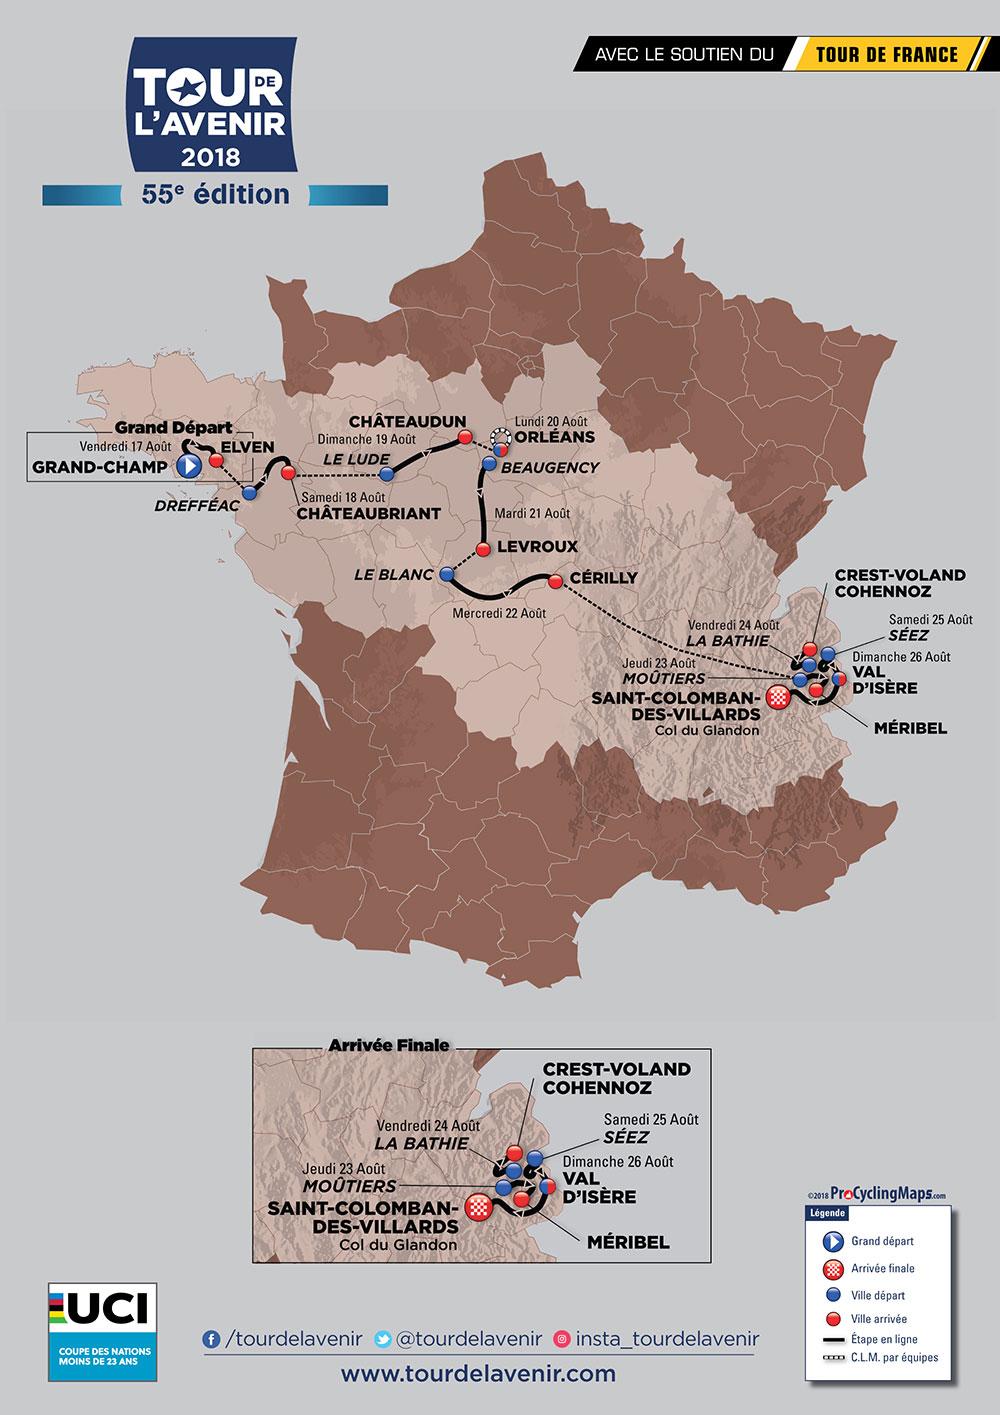 Tour de l'Avenir 2018 - Recorrido